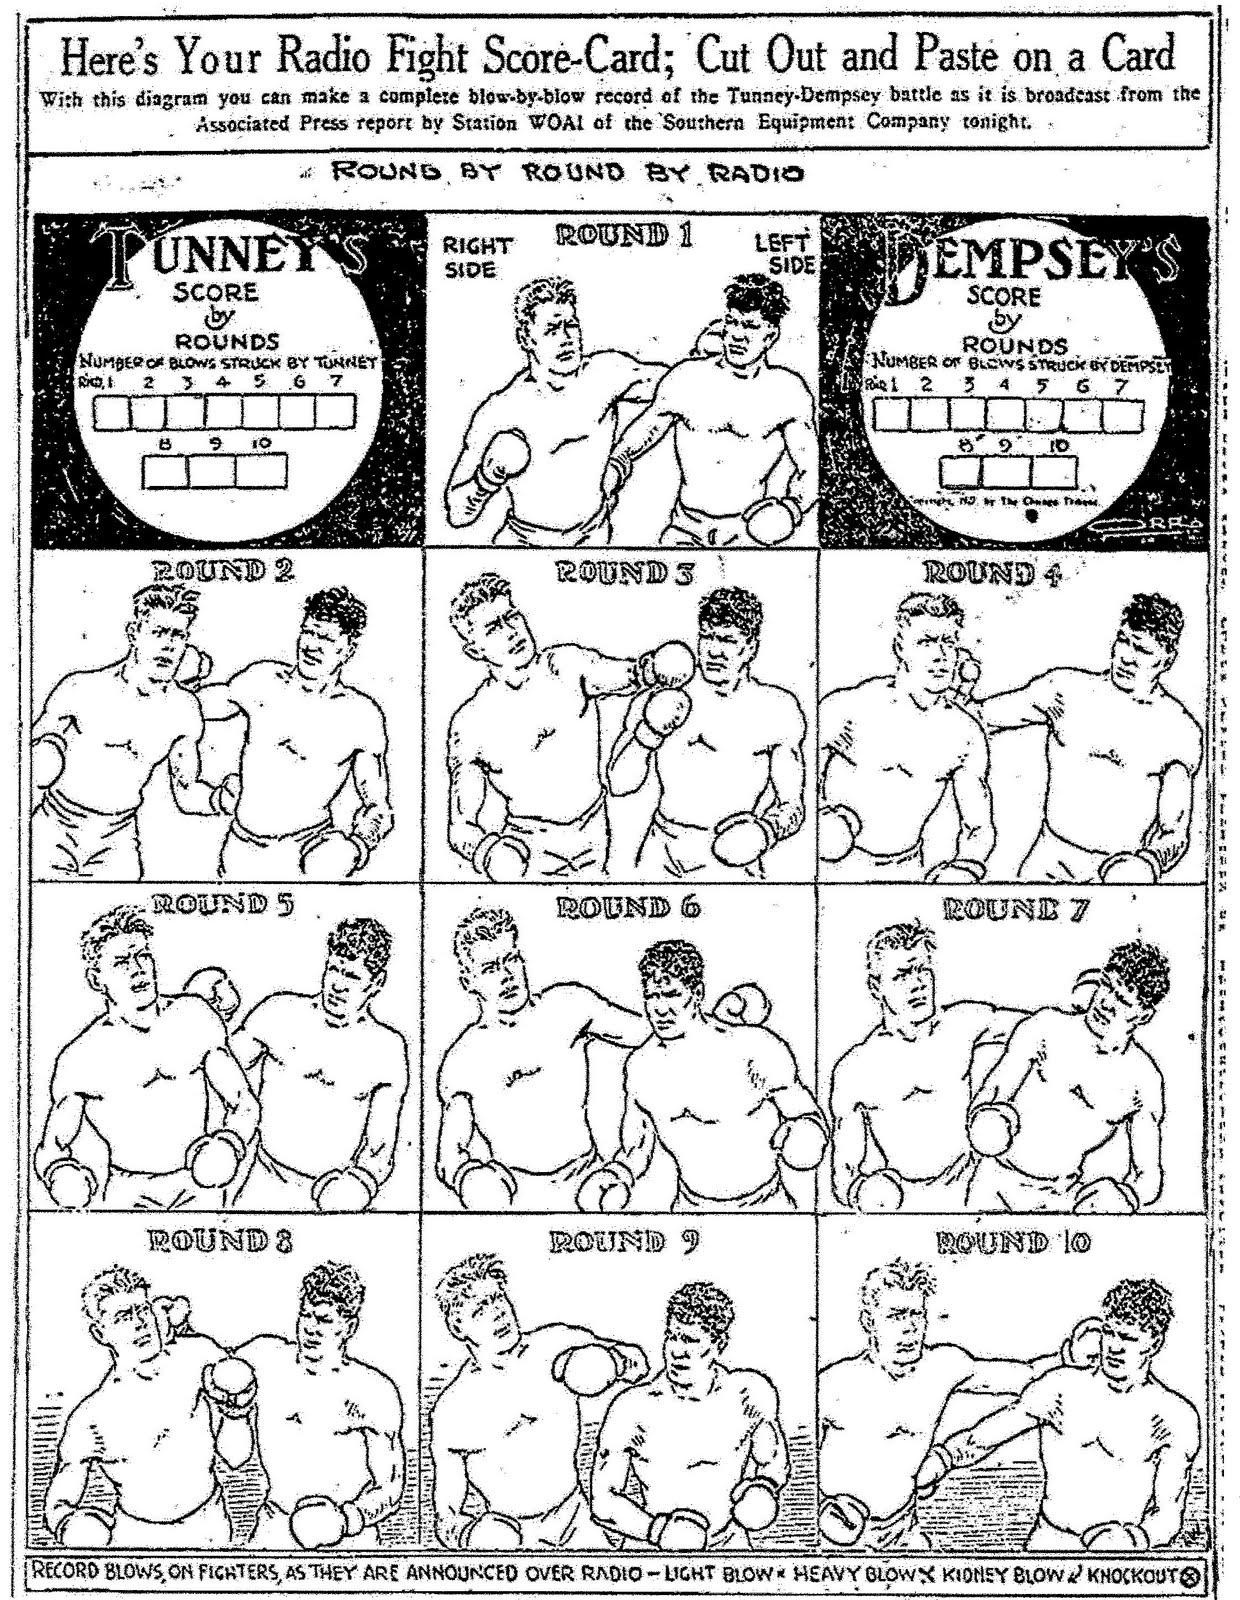 BN Dempsey-Tunney 2 fight scorecard cartoon.